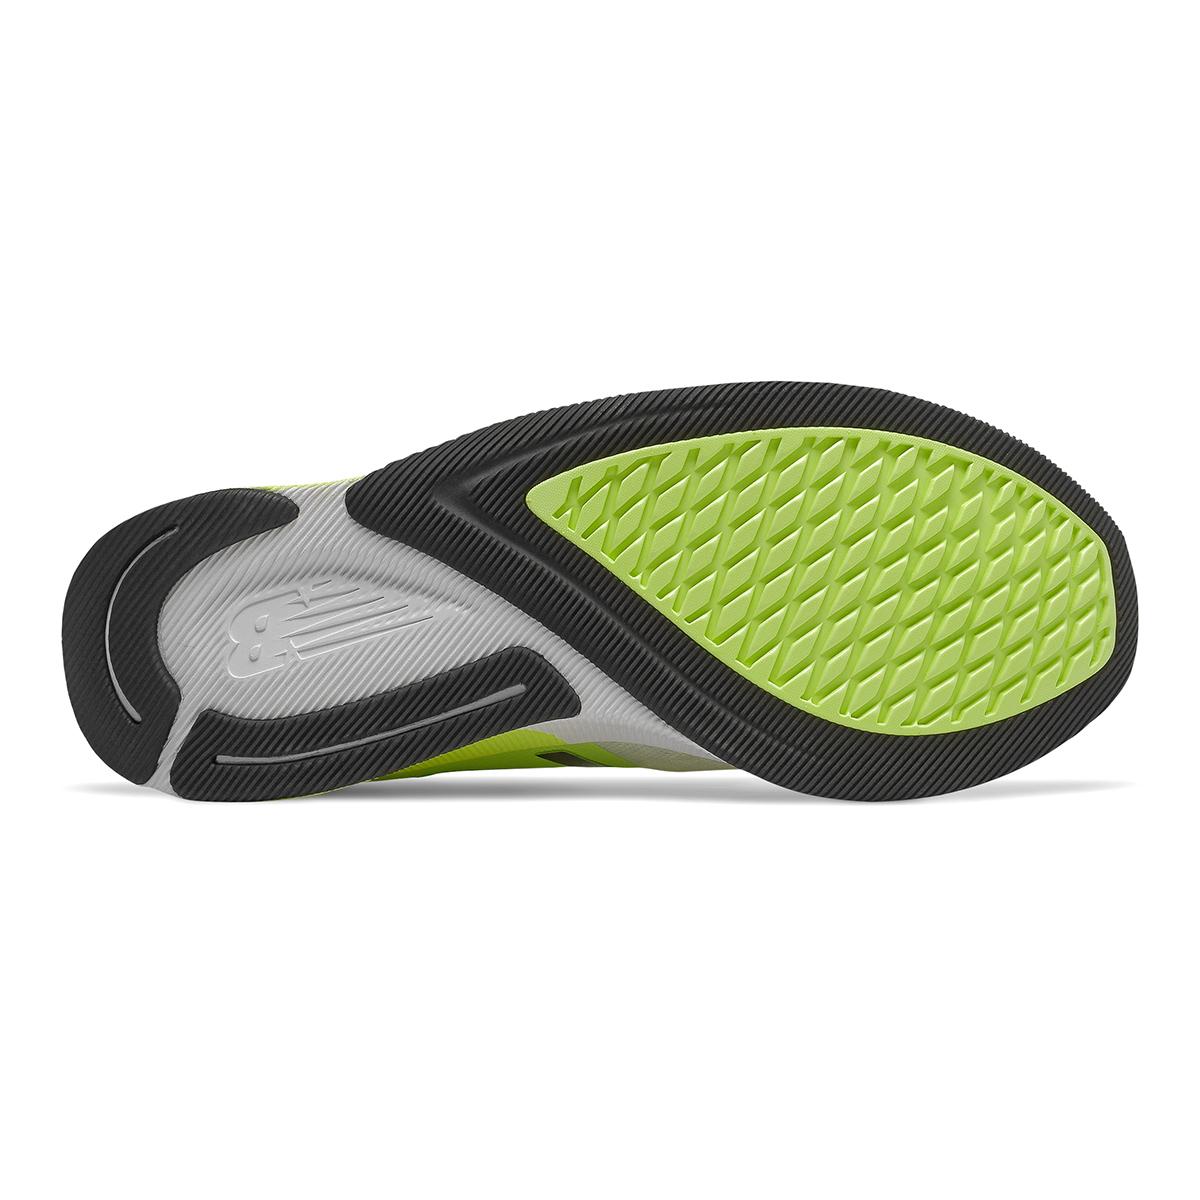 Men's New Balance 890V8 Running Shoe - Color: White (Wide Width) - Size: 7, White, large, image 4